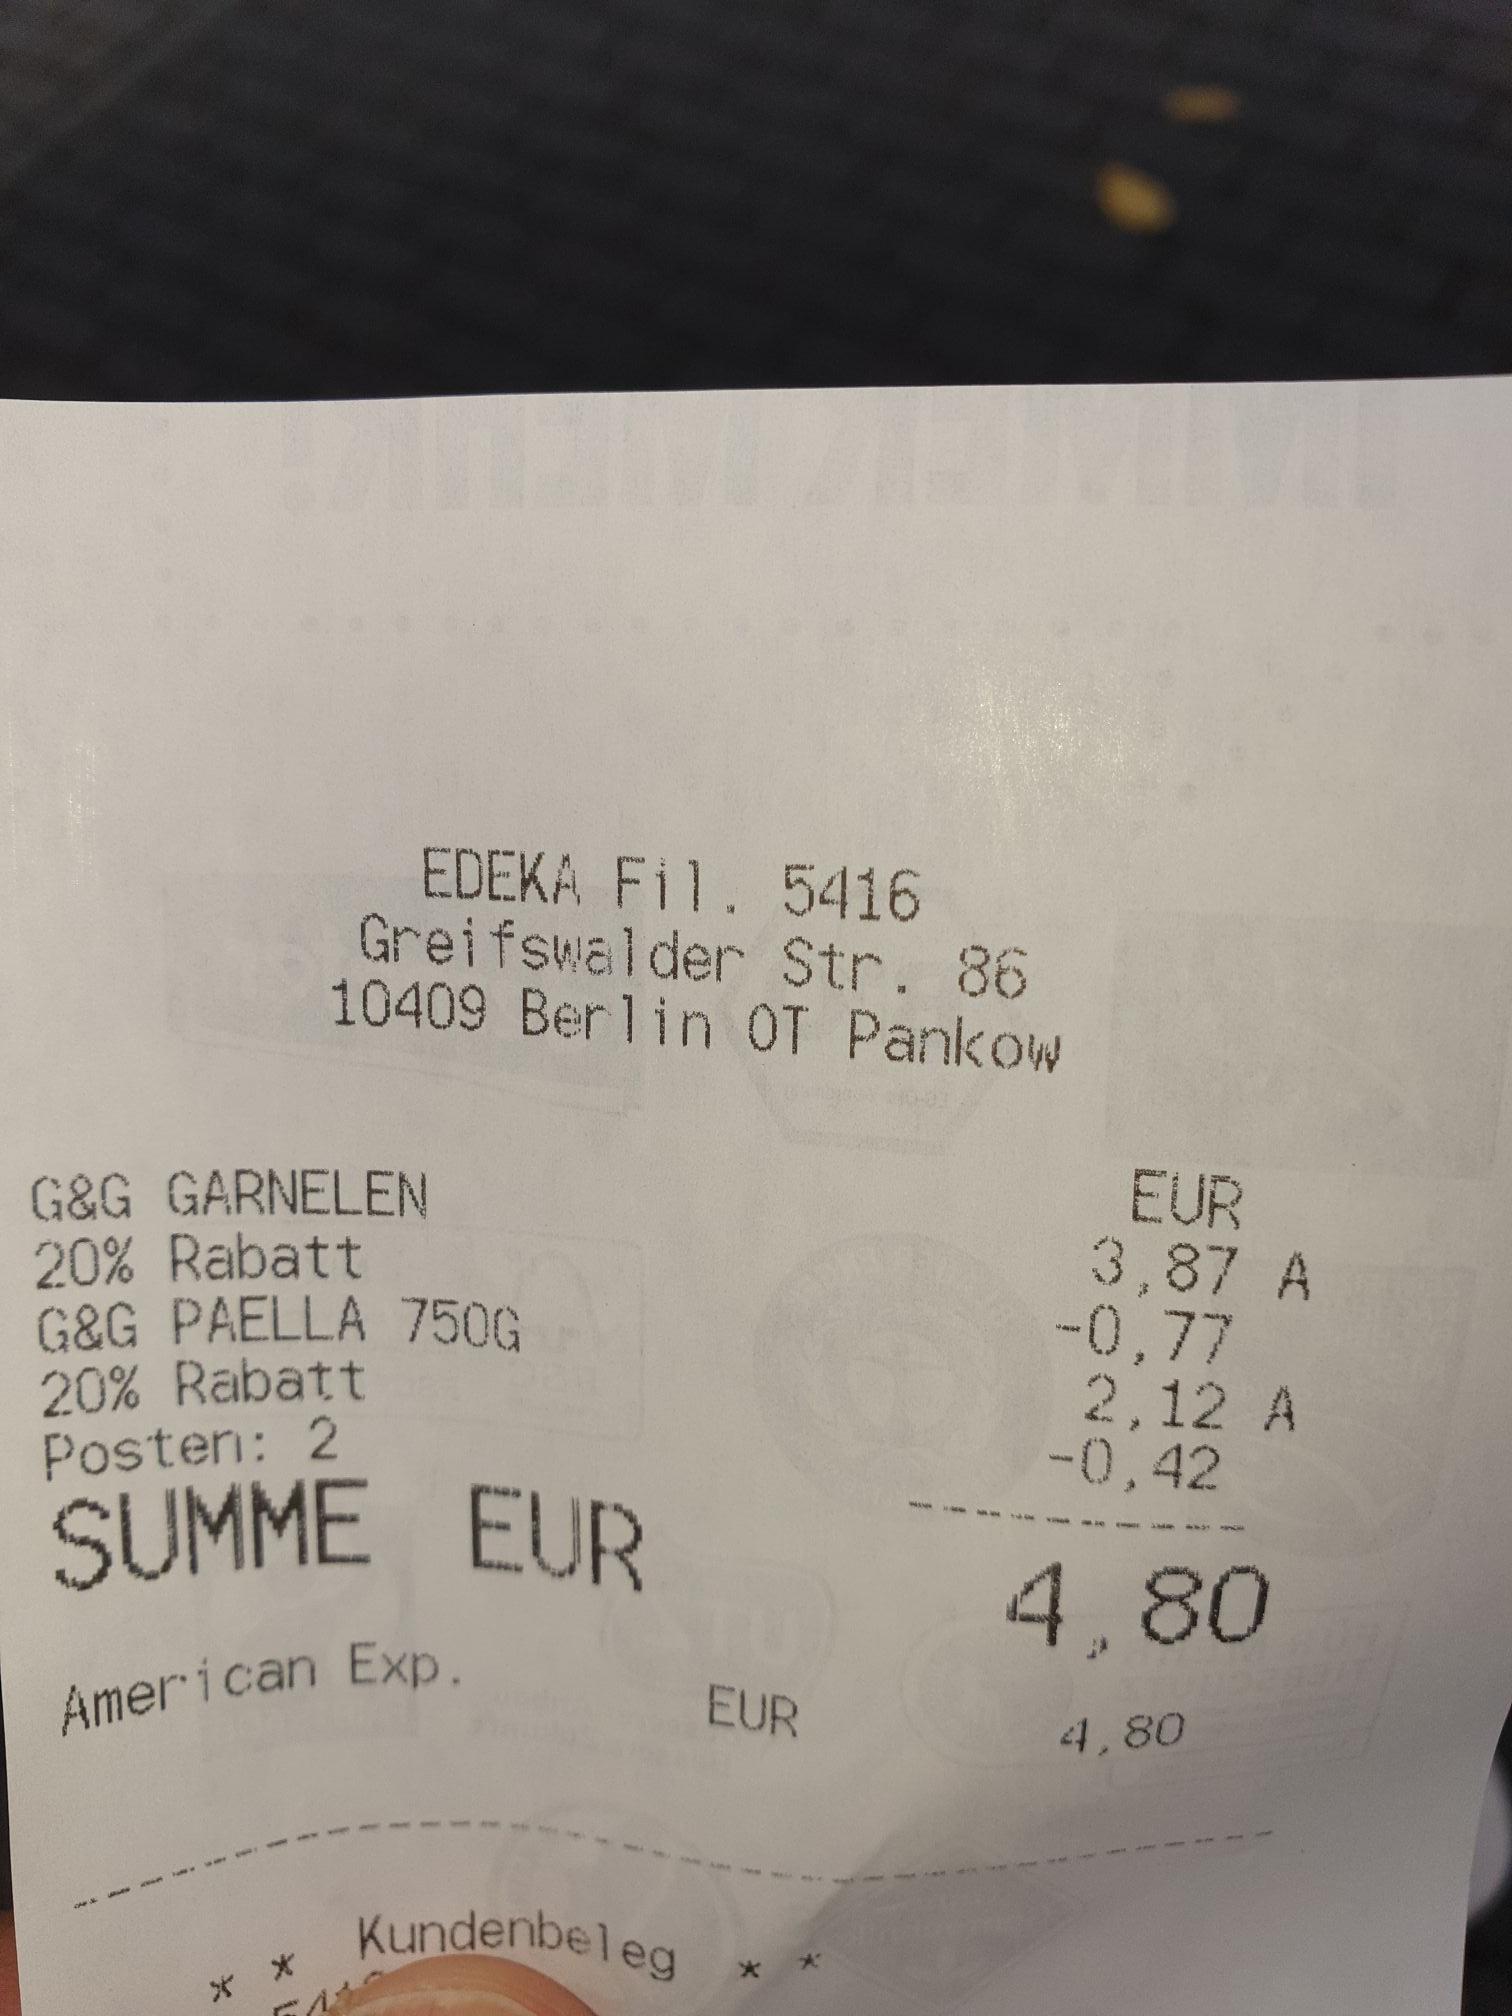 (LOKAL EDEKA Berlin-Greifswalder Str.) 20% Rabatt auf G&G TK-Produkte